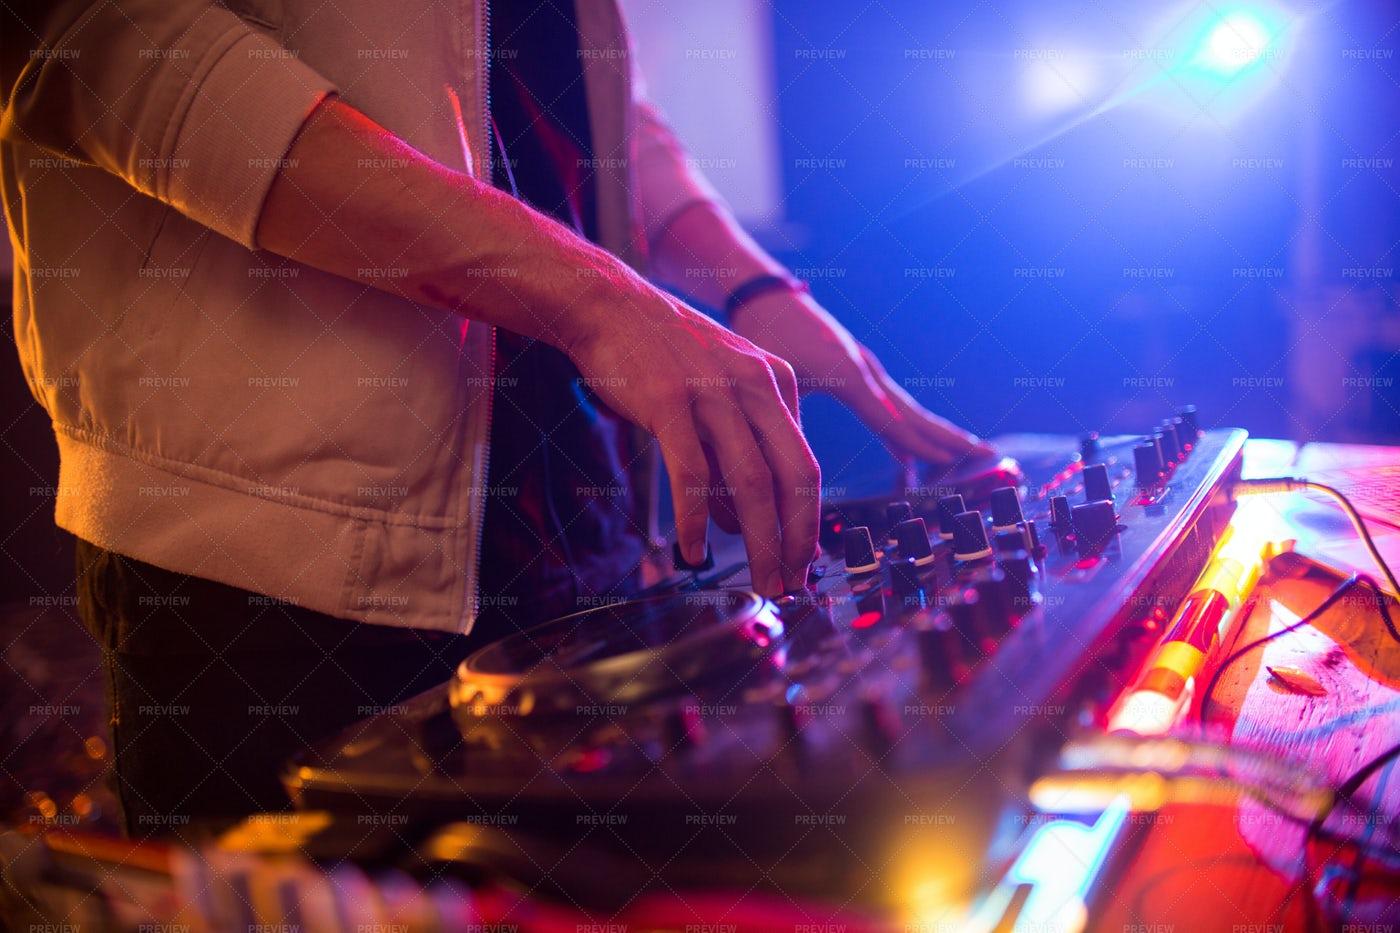 Unrecognizable DJ At Club Party...: Stock Photos